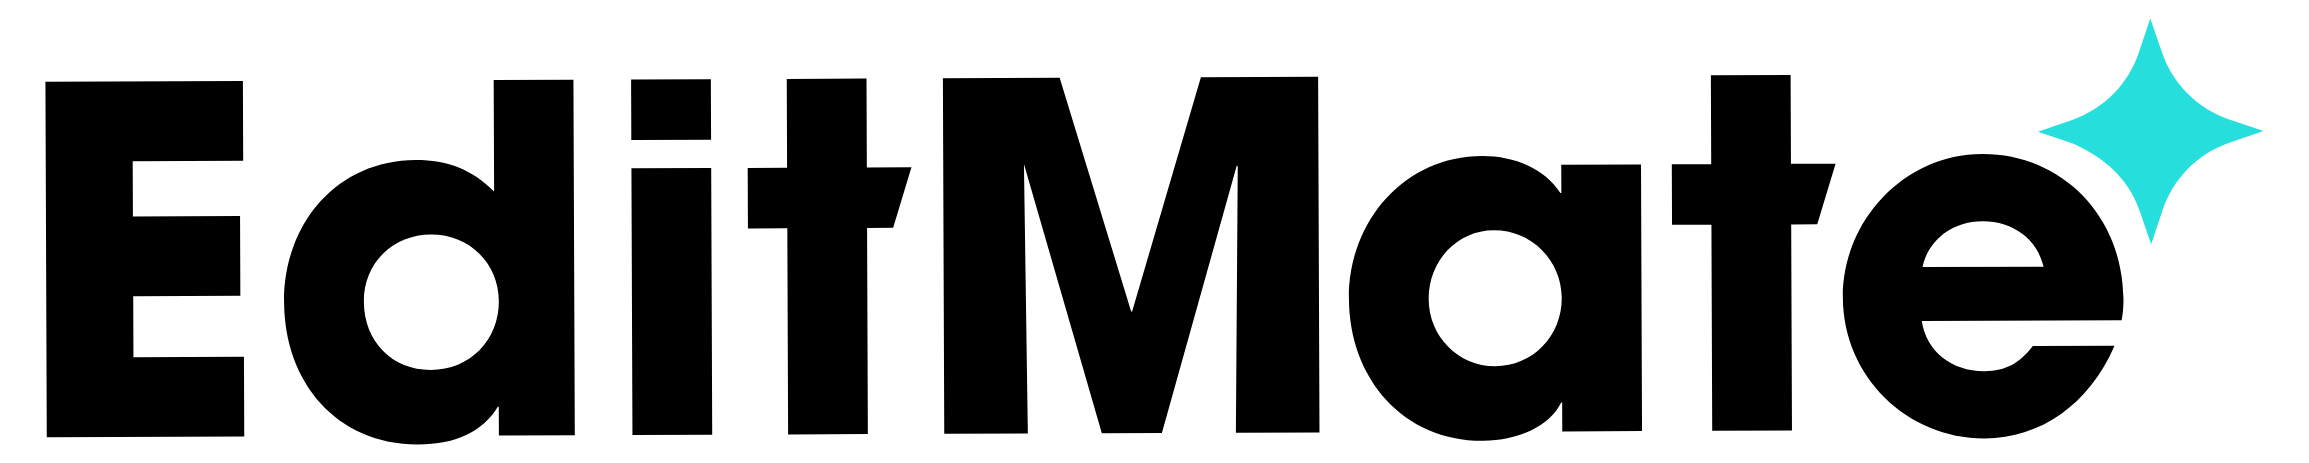 Editmate logo